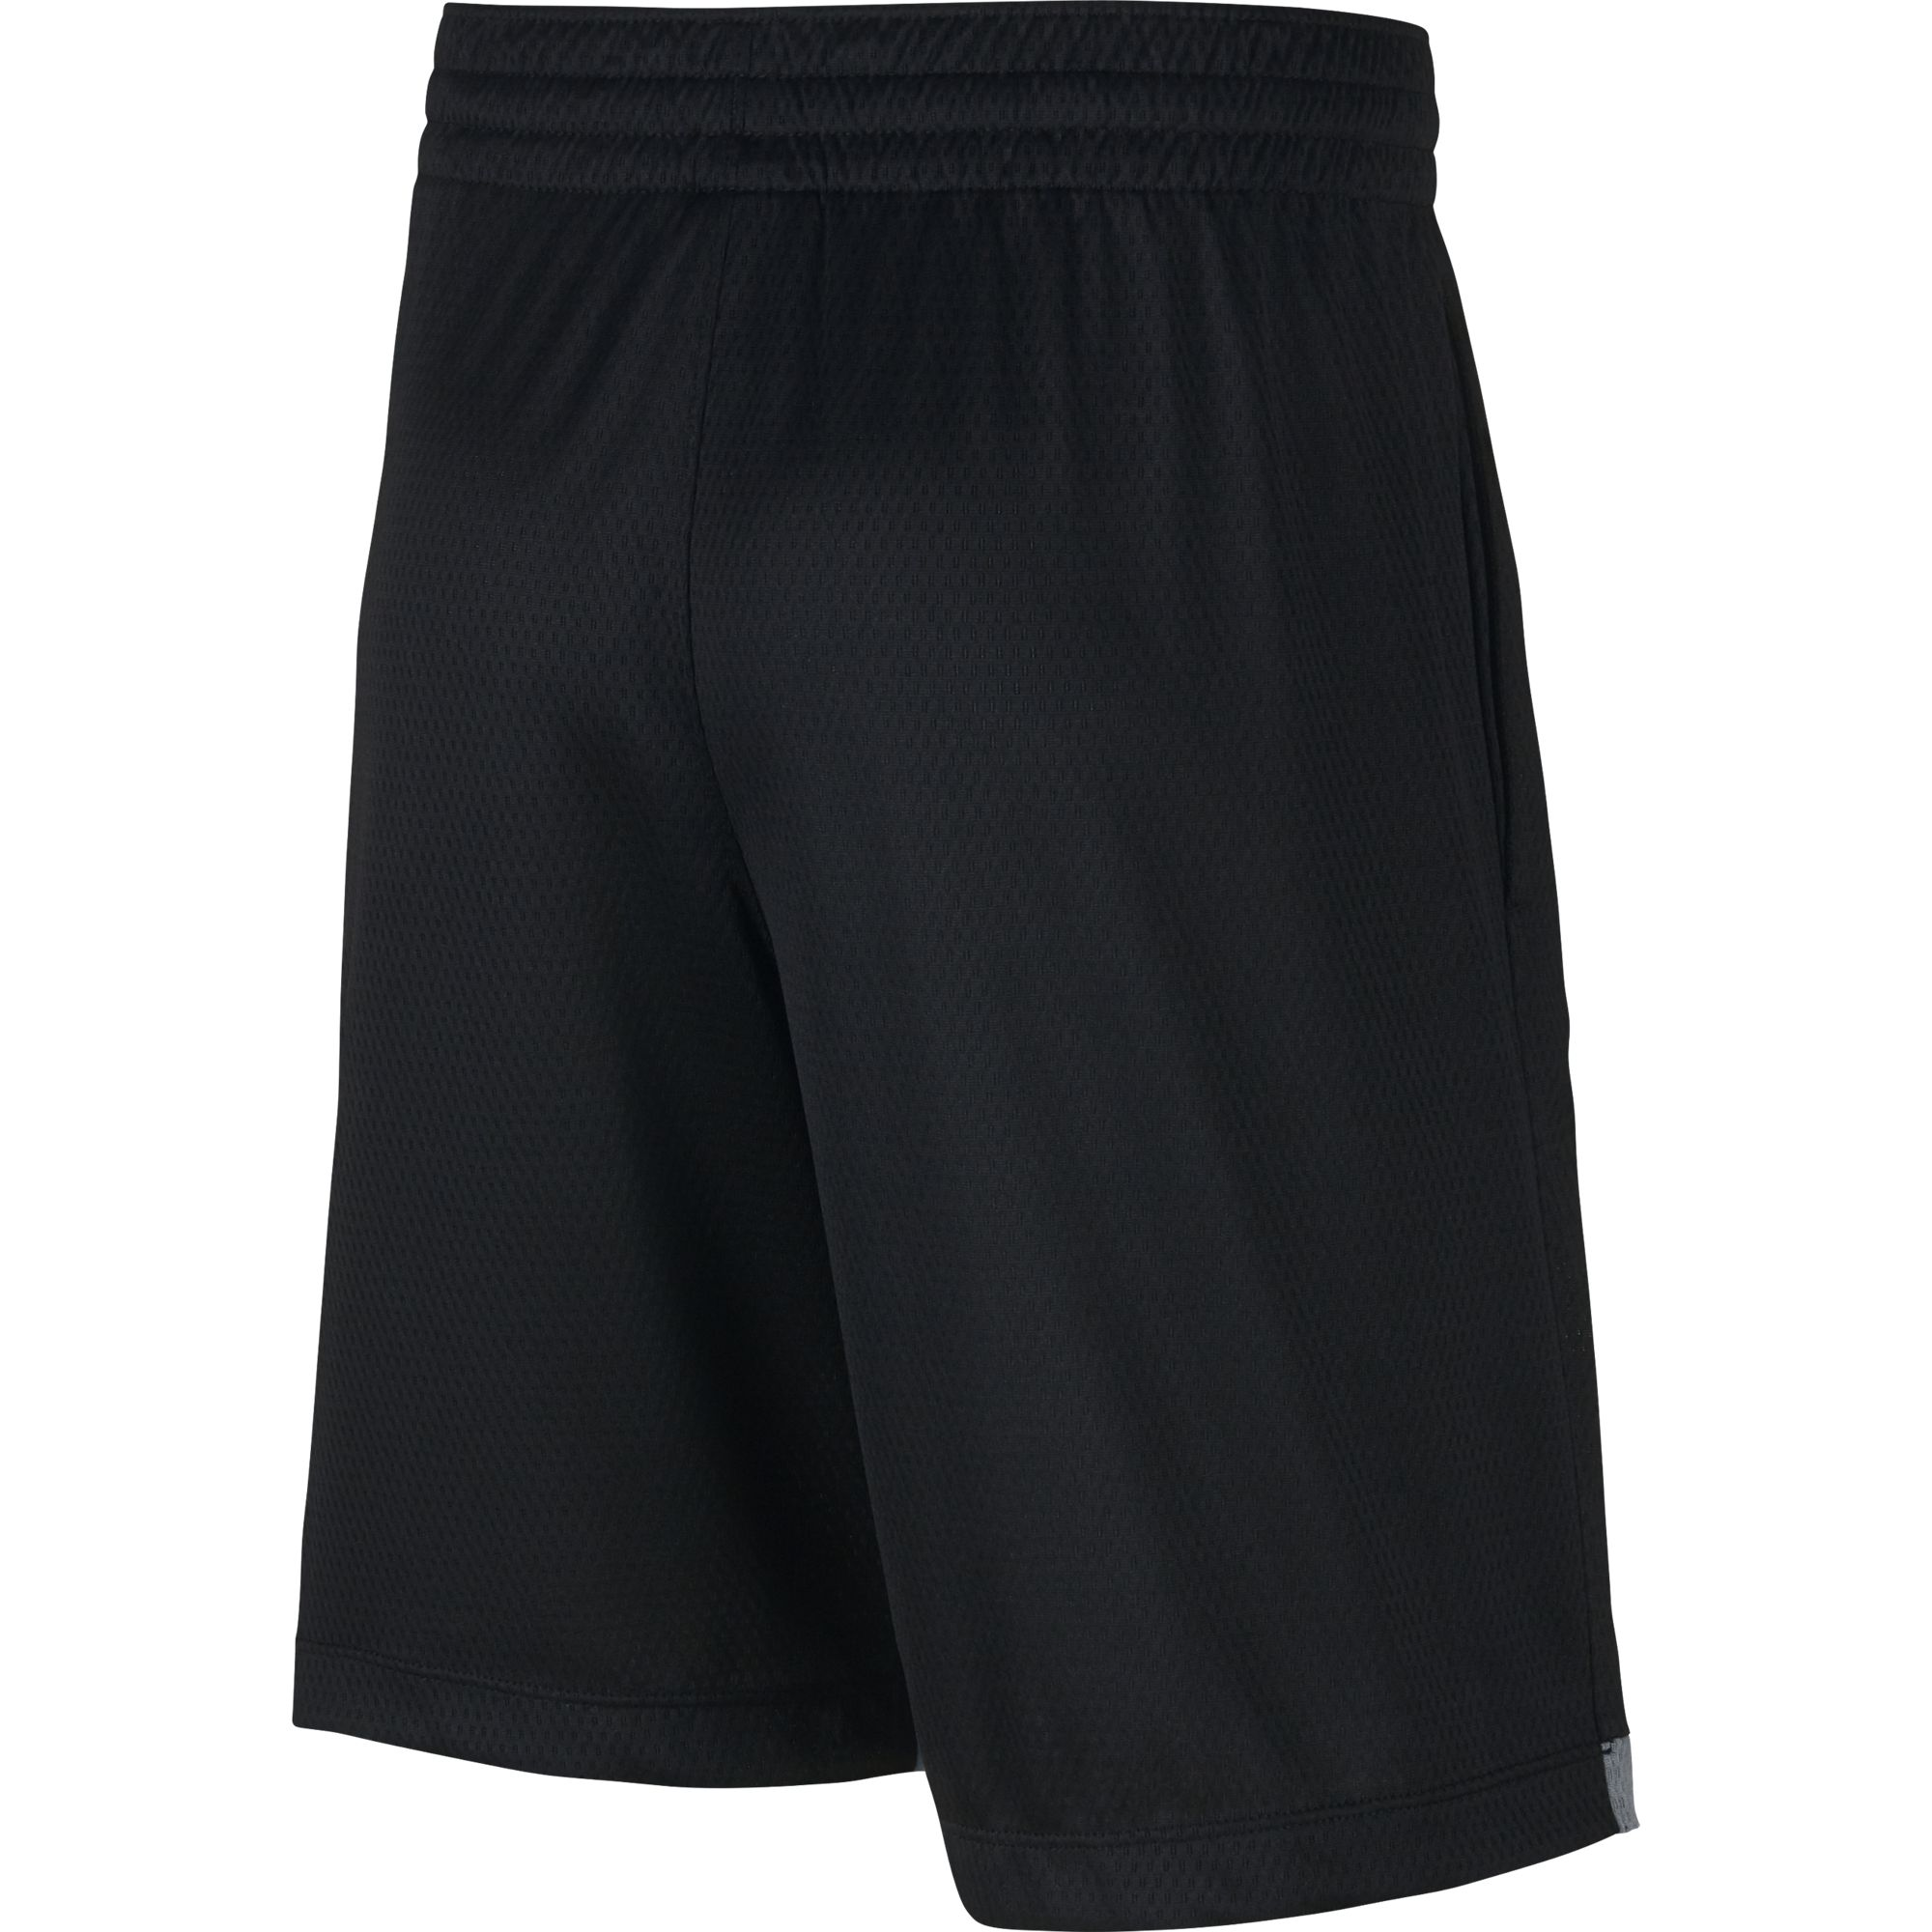 Boys' DriFit Training Shorts, Black, swatch